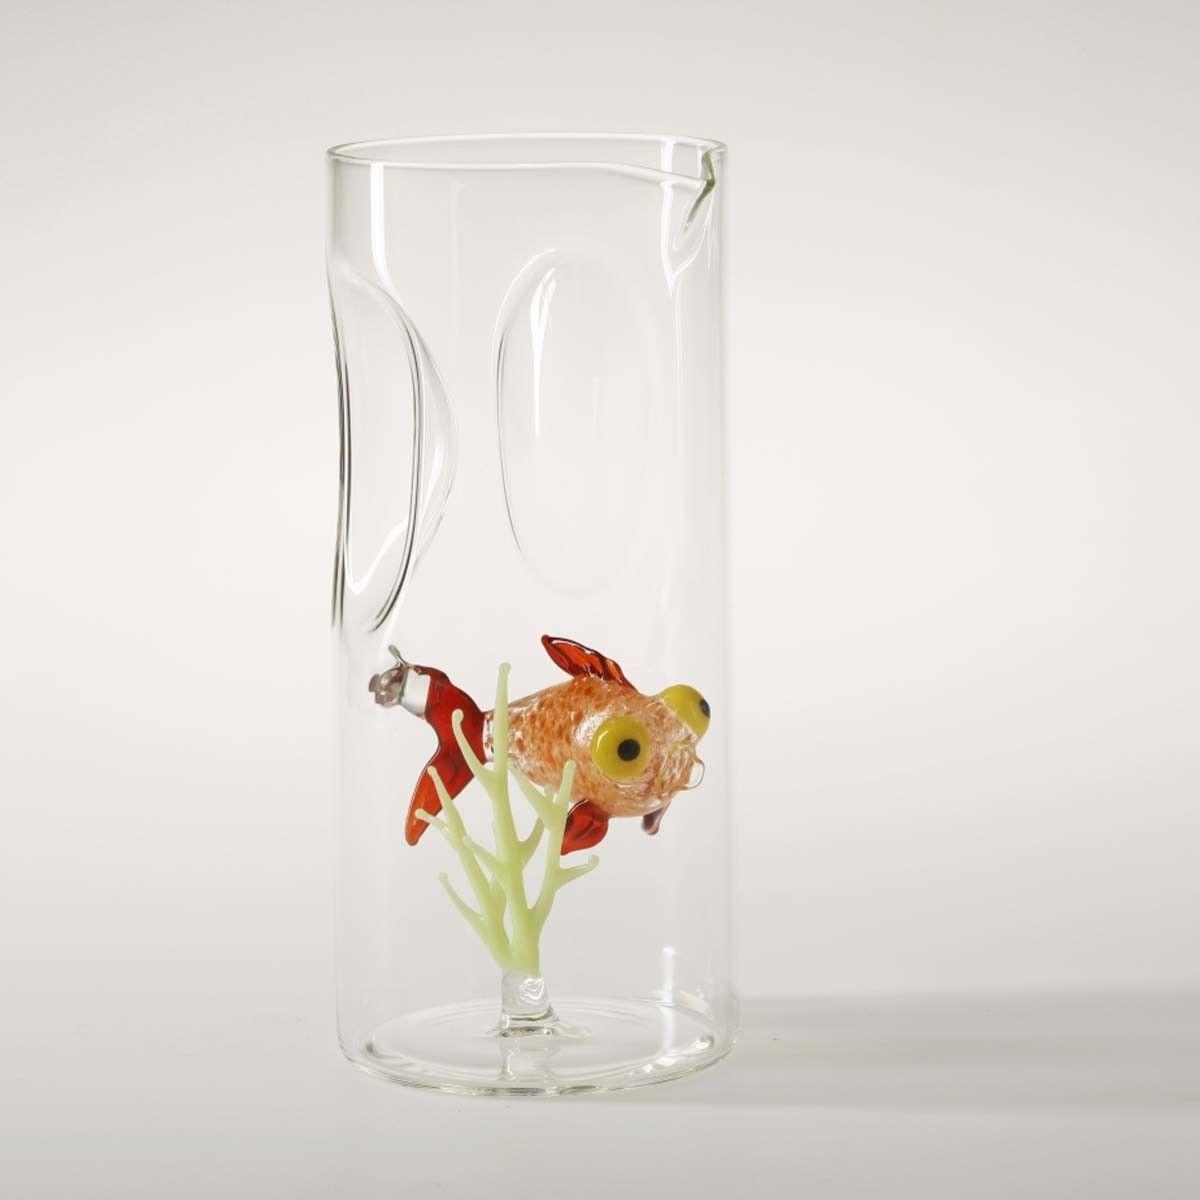 The Best of european artist: Massimo Lunardon glass work The Best of Glass work and Lampworking art: Massimo Lunardon Massimo Lunardon Golden Fish